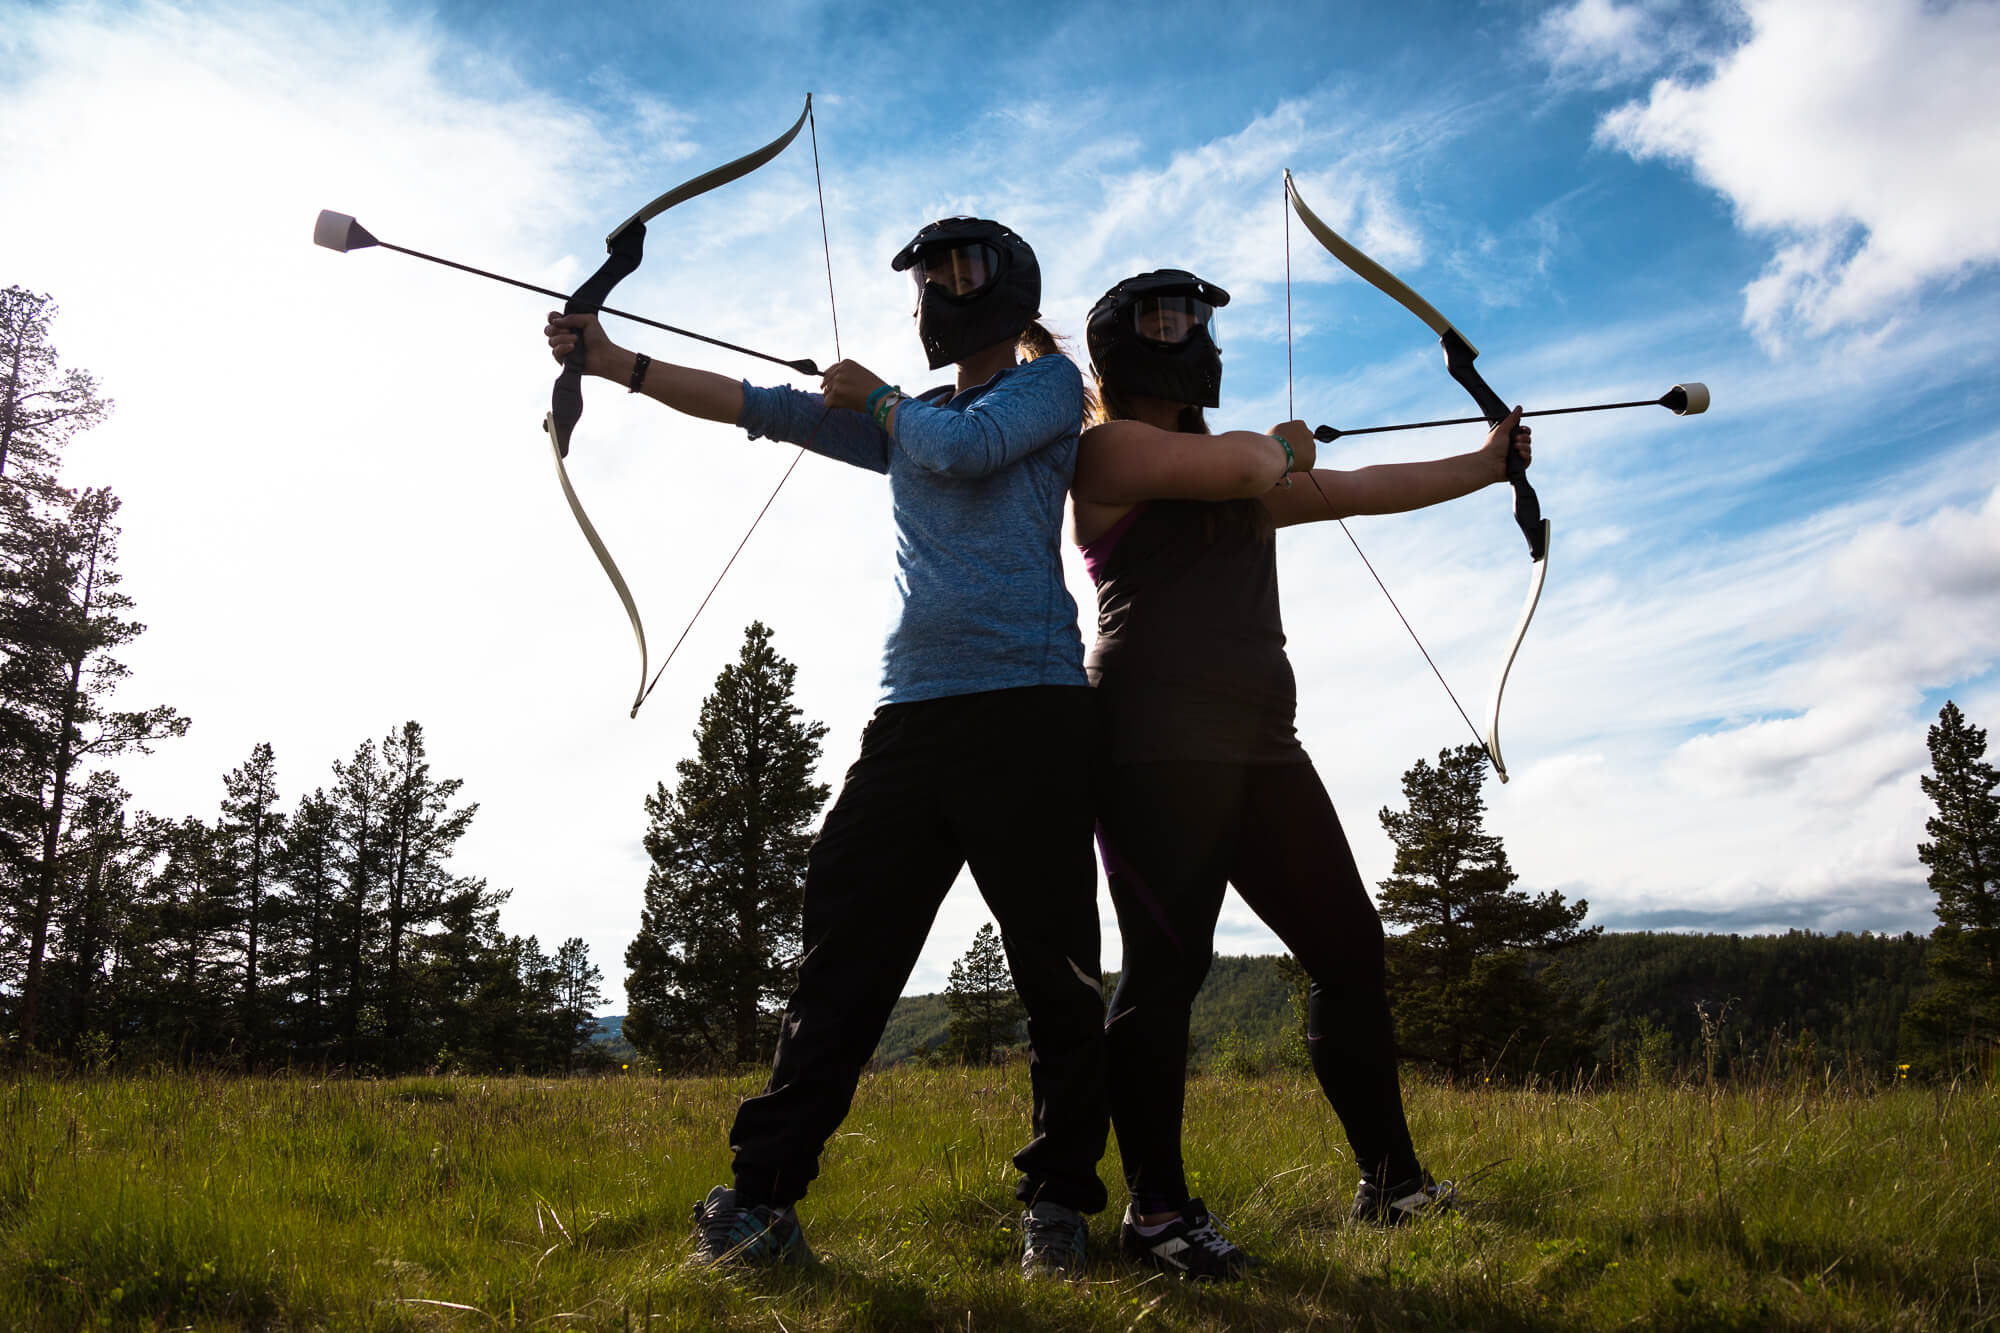 Gruppe: Archery tag